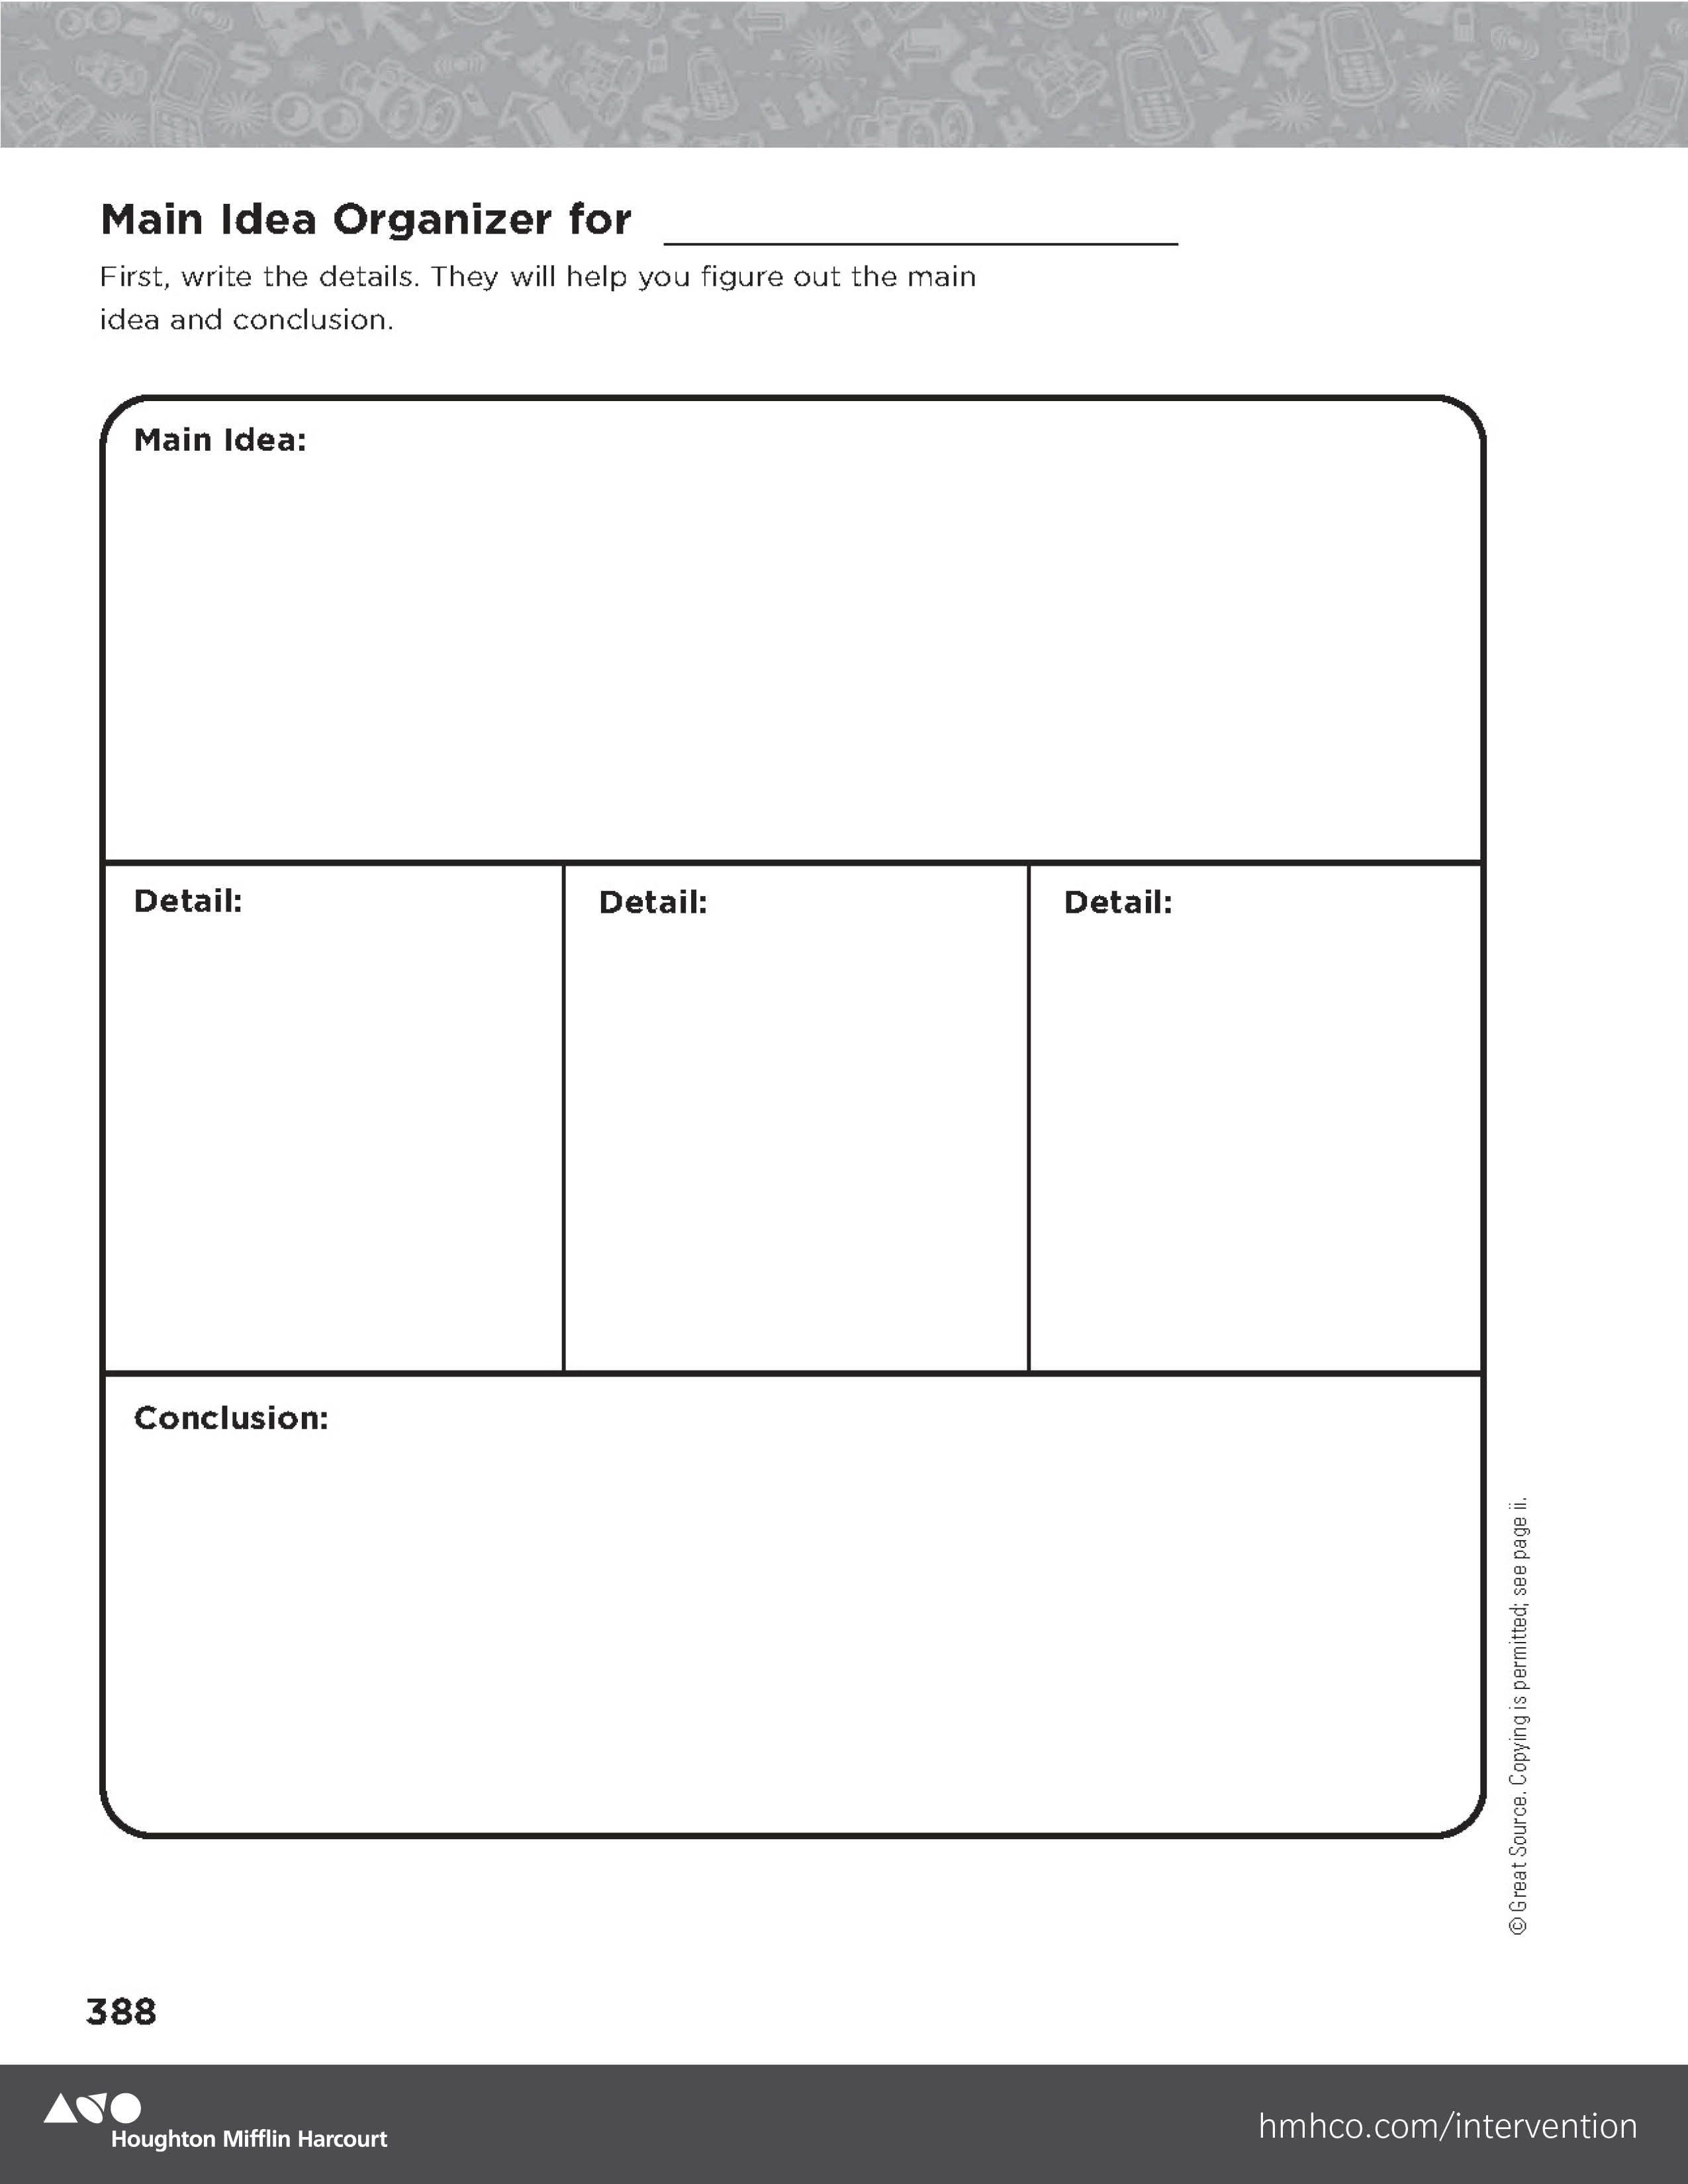 Main Idea Organizer Grades 6 8 Download And Print This Main Idea Gaphic Organizer Visit Hmhco Com Inter Reading Intervention Intervention Teaching Reading [ 3300 x 2550 Pixel ]